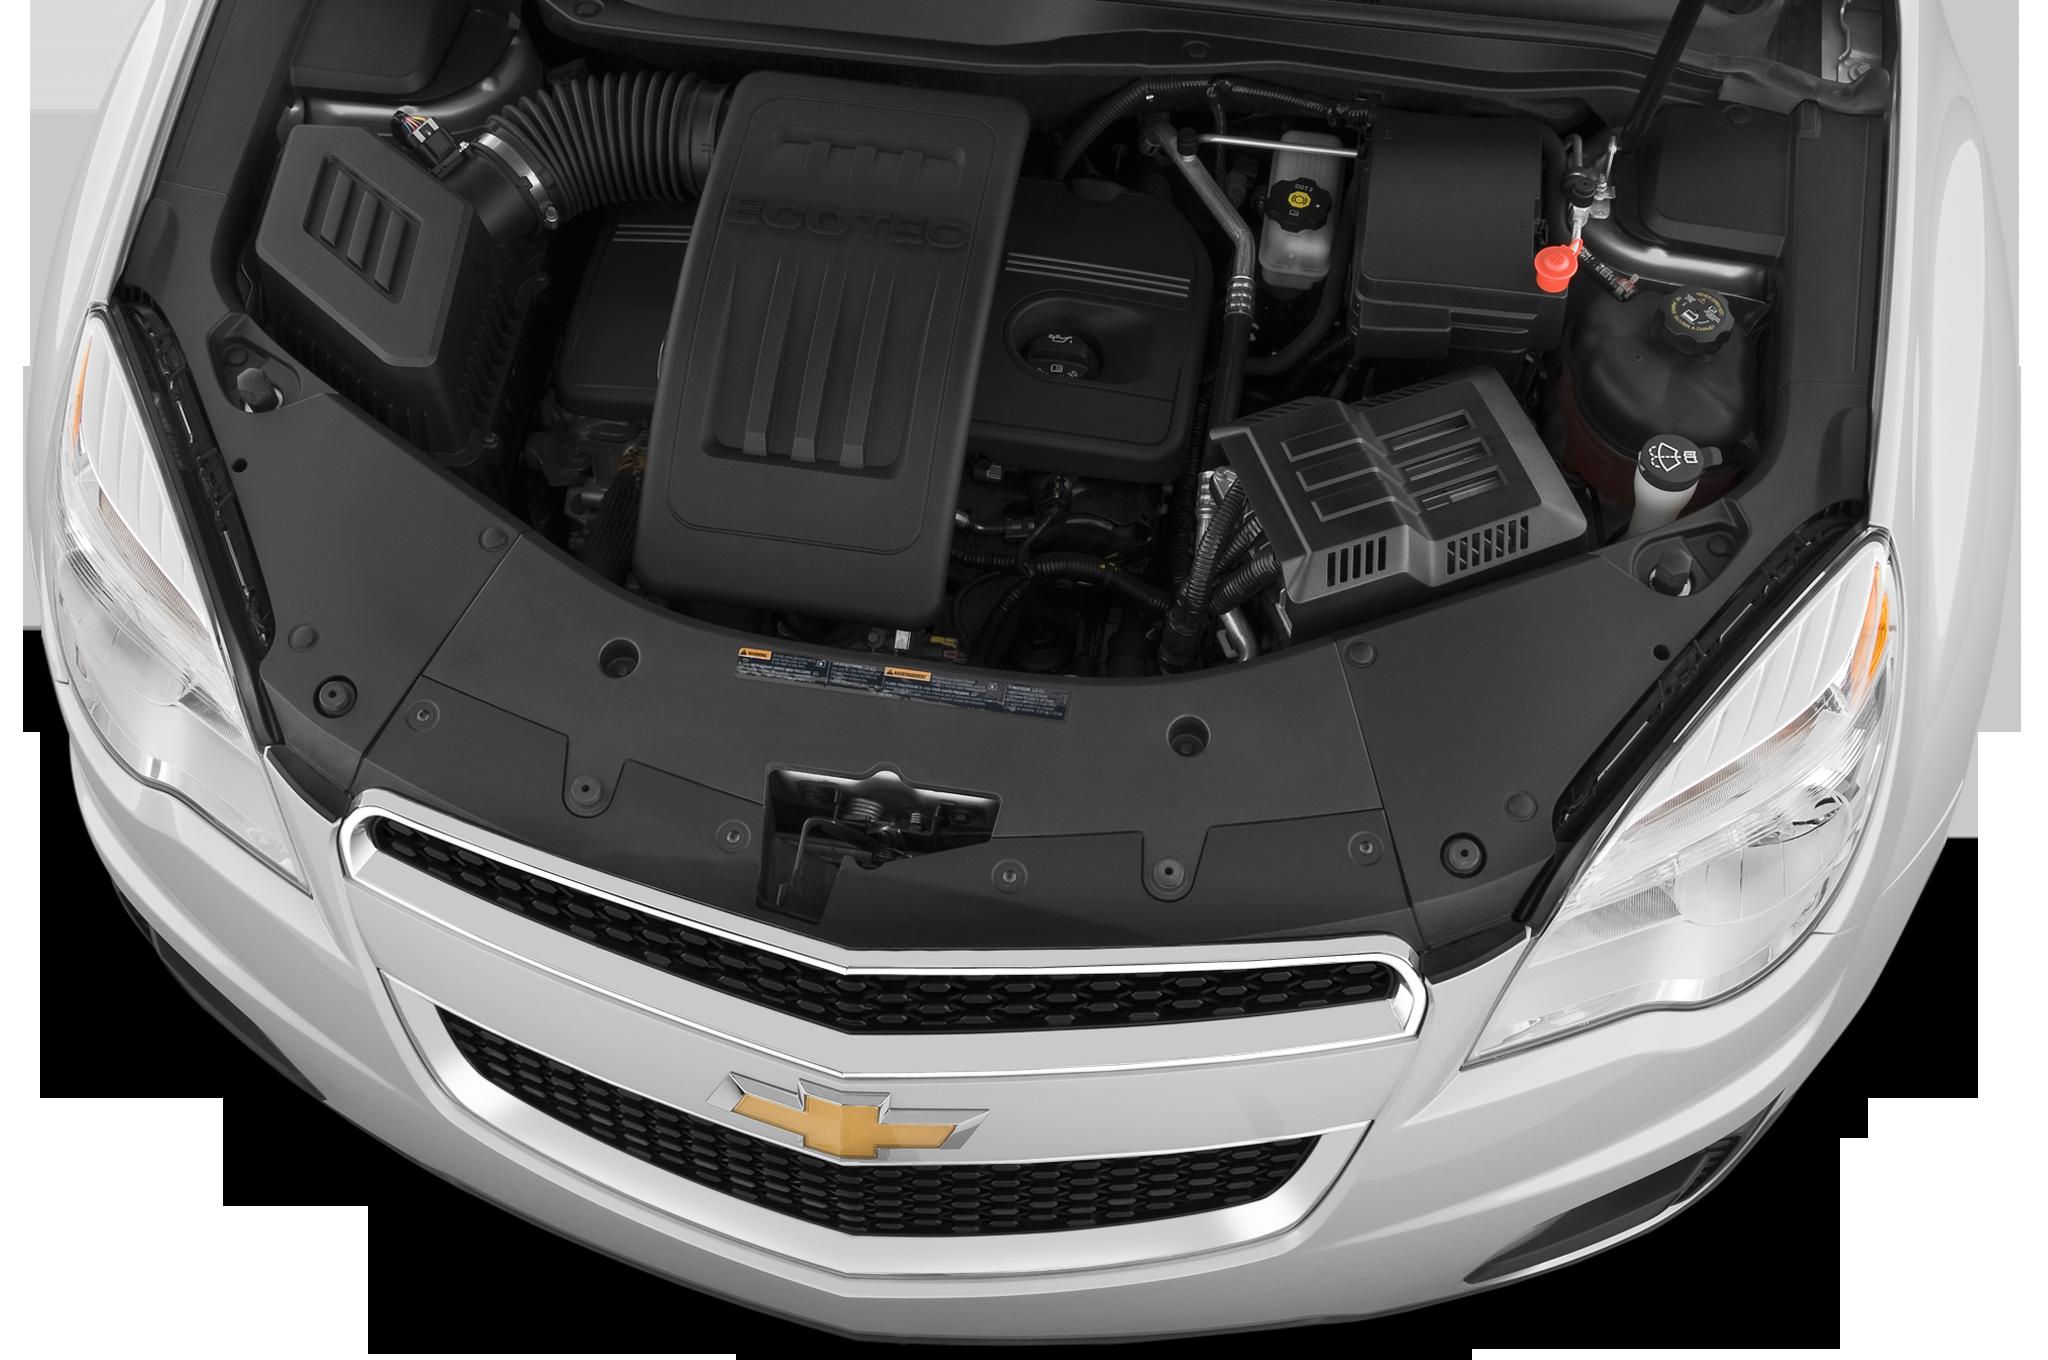 2010 Chevy Equinox LTZ AWD - Chevrolet Crossover SUV ...